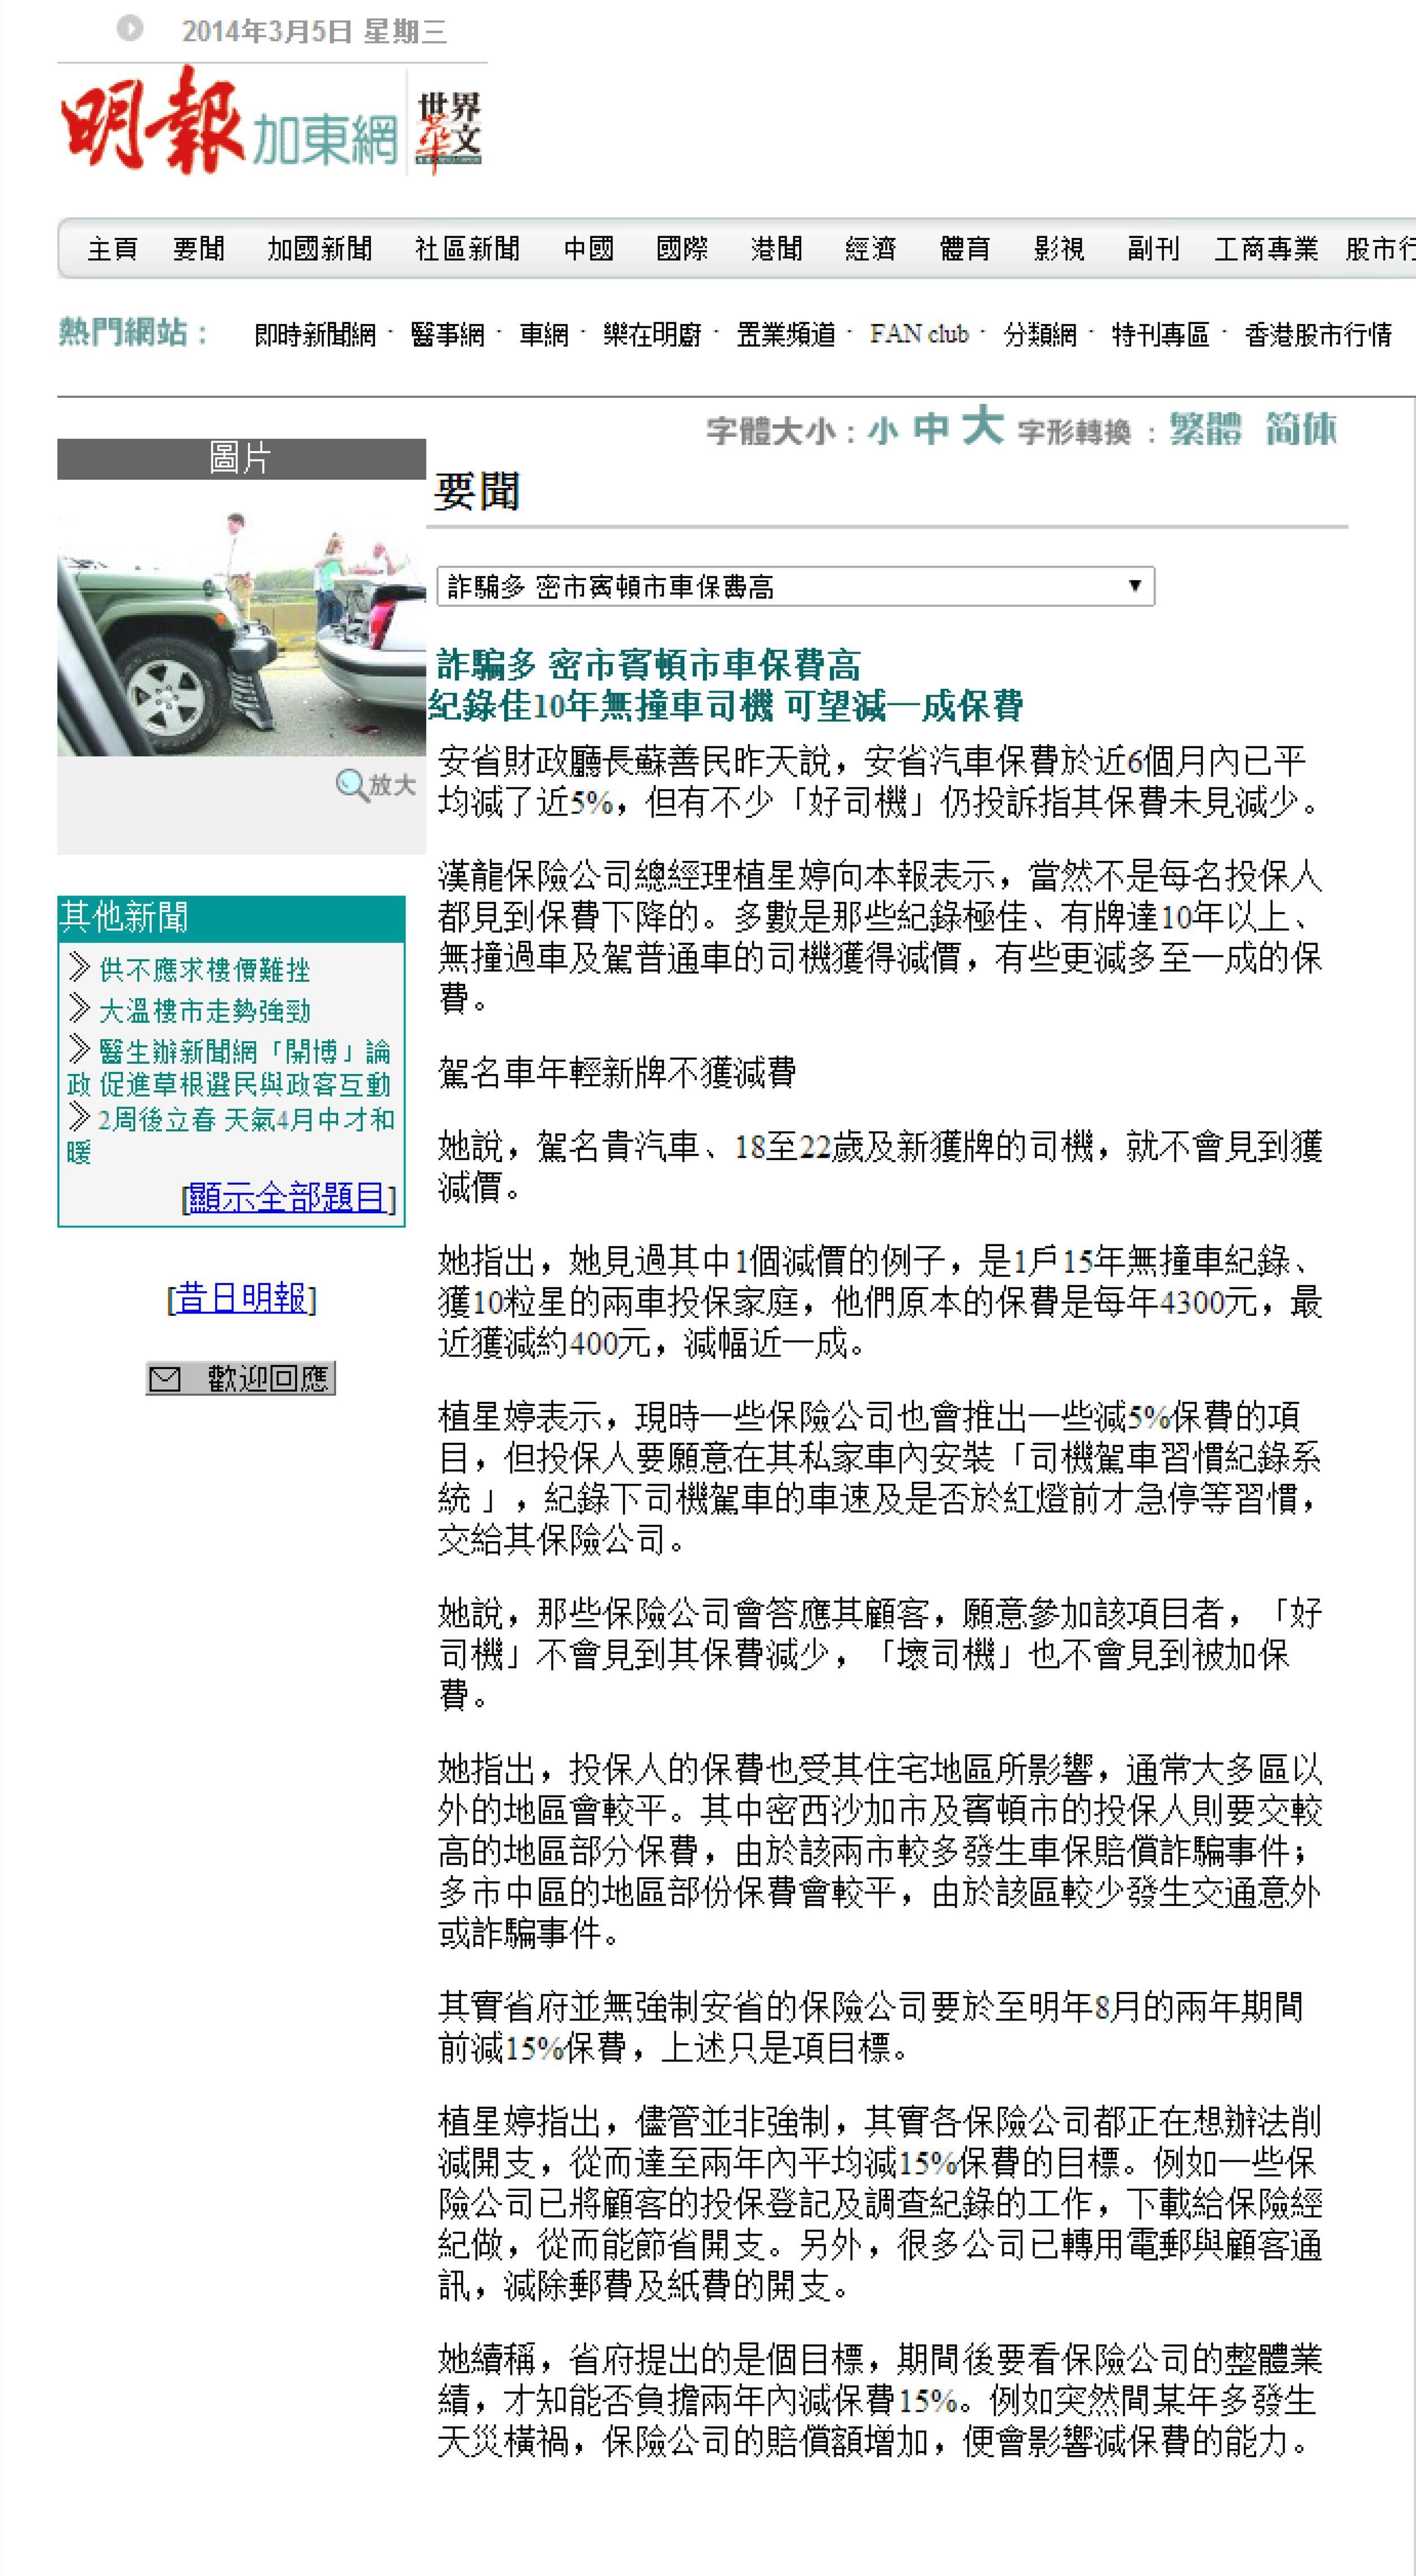 明報新聞網海外版 - 加東版(多倫多) - Canada Toronto Chinese Newspaper - 要聞' - www_mingpaotor_com_htm_News_20140305_tba2_htm_m=0_01.jpg